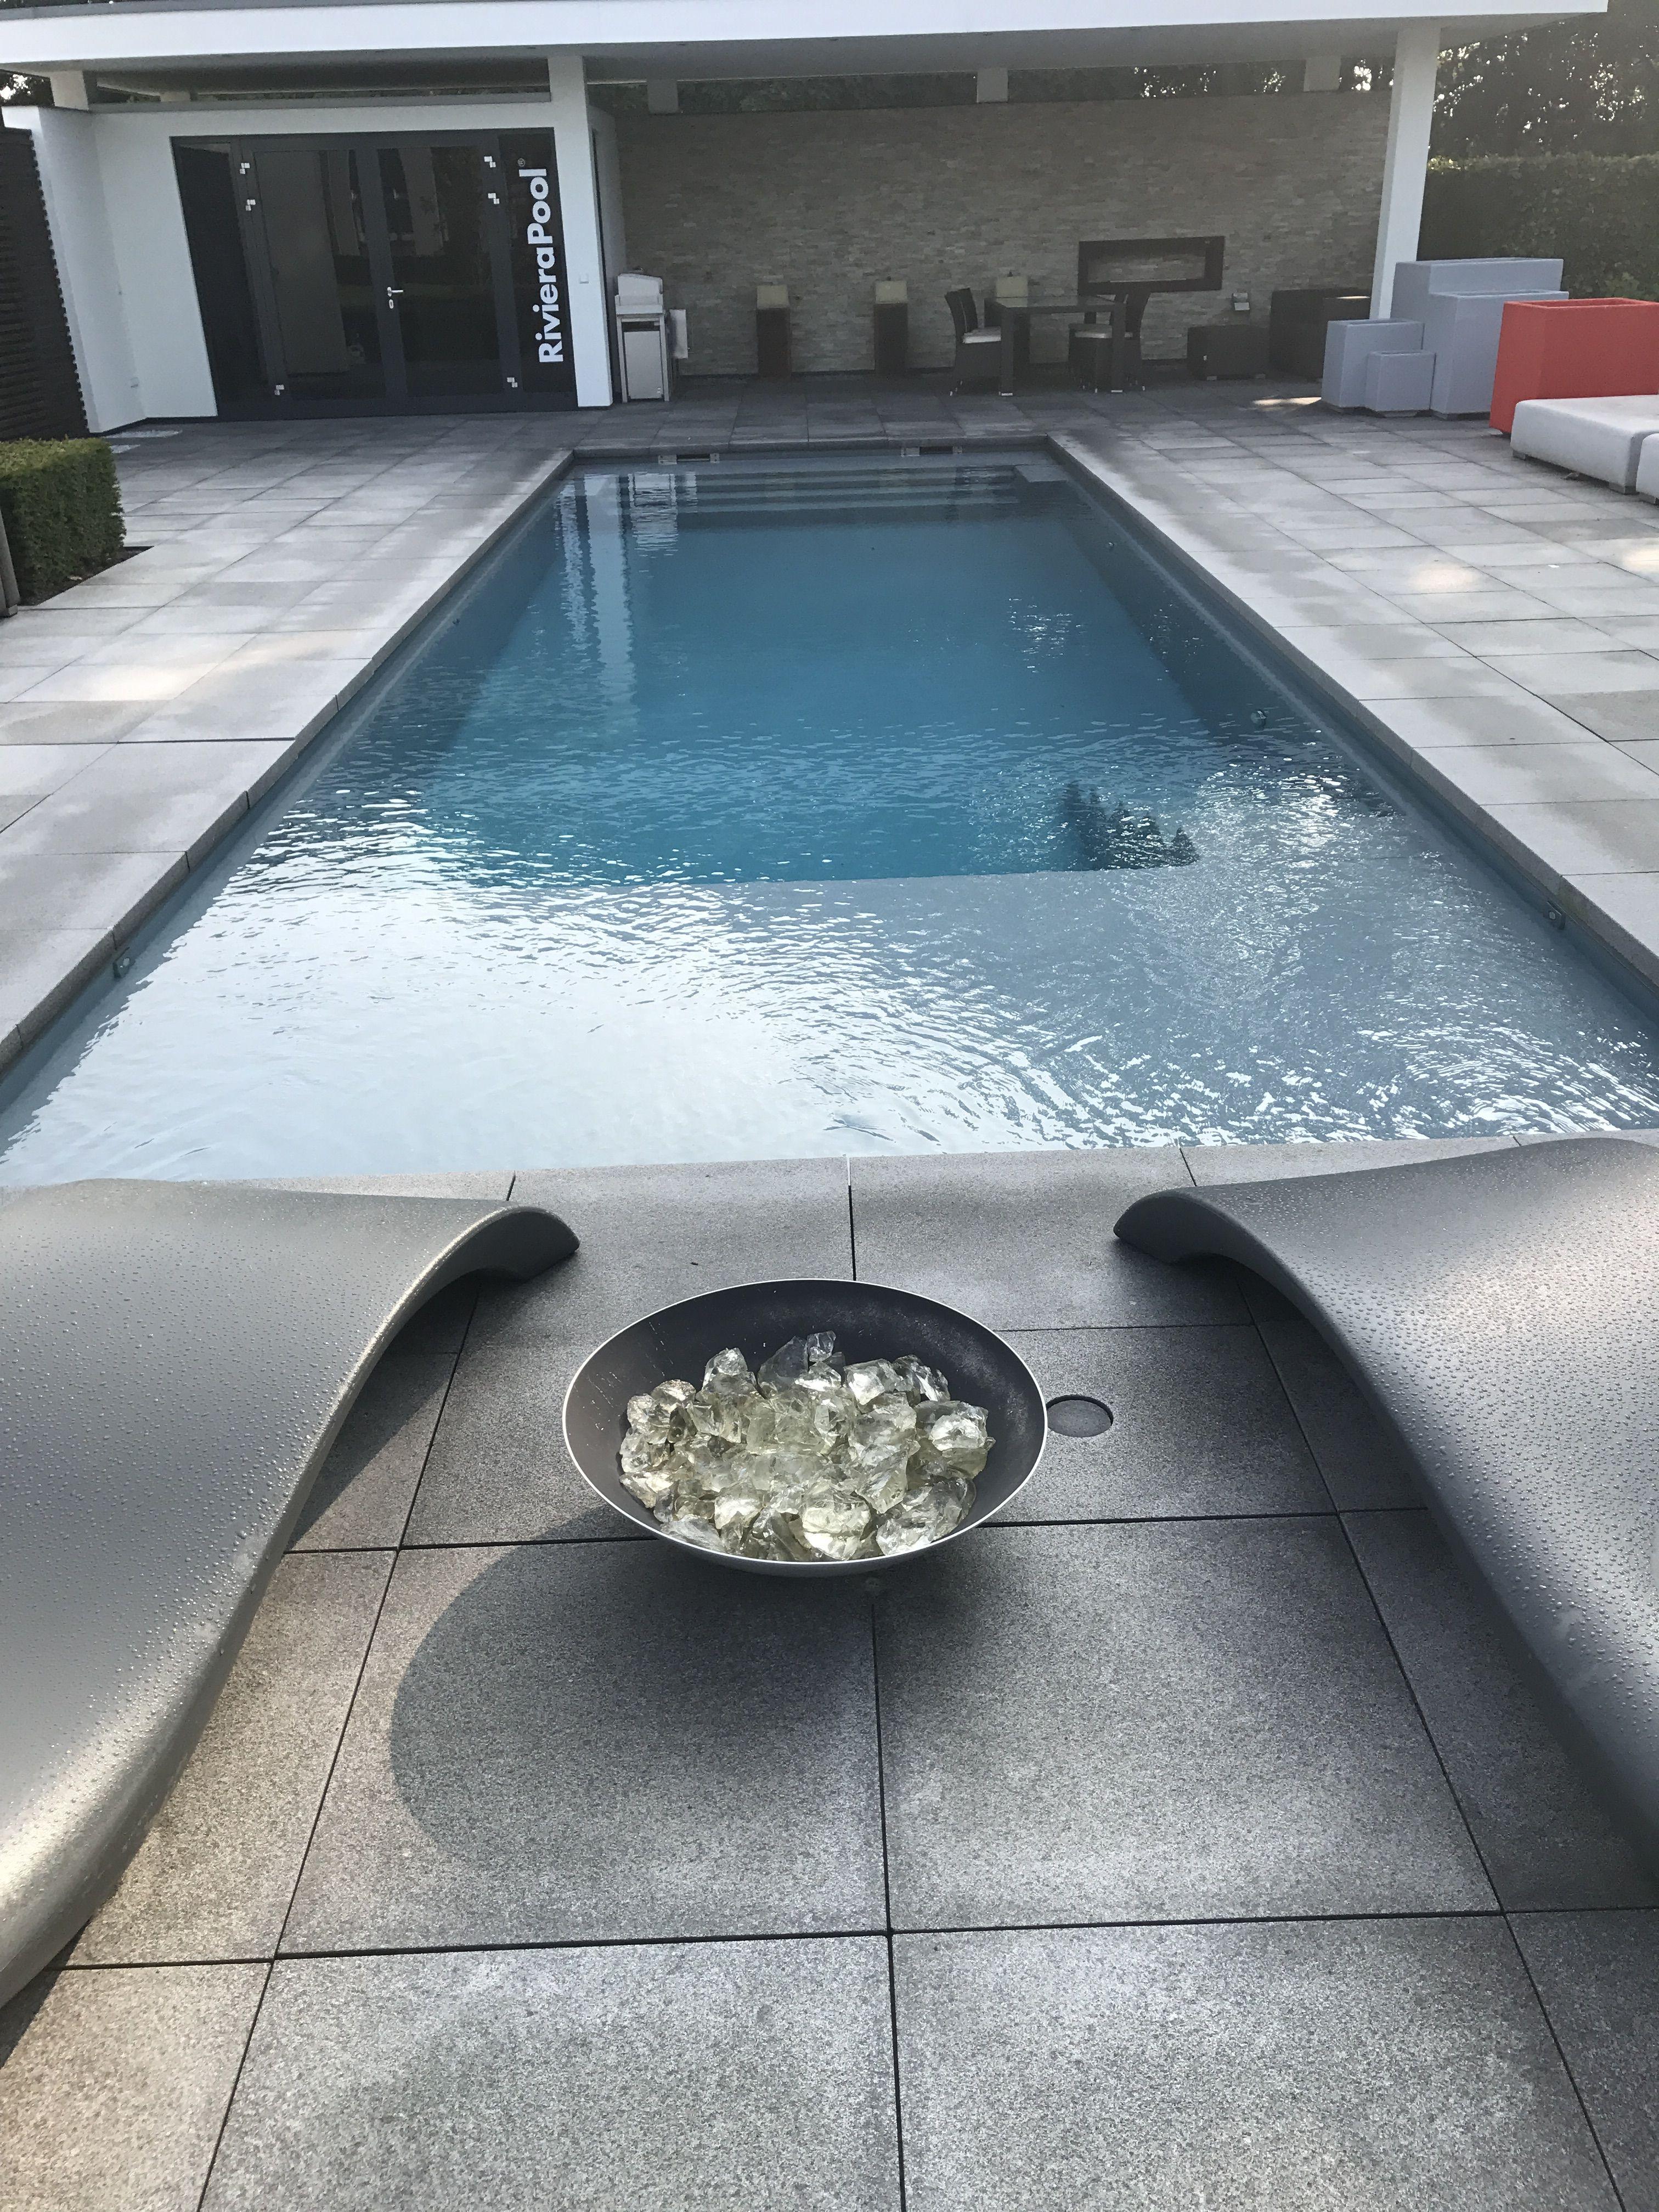 Pool mit chill lounge im Wasser 10x3,70 Chill lounge